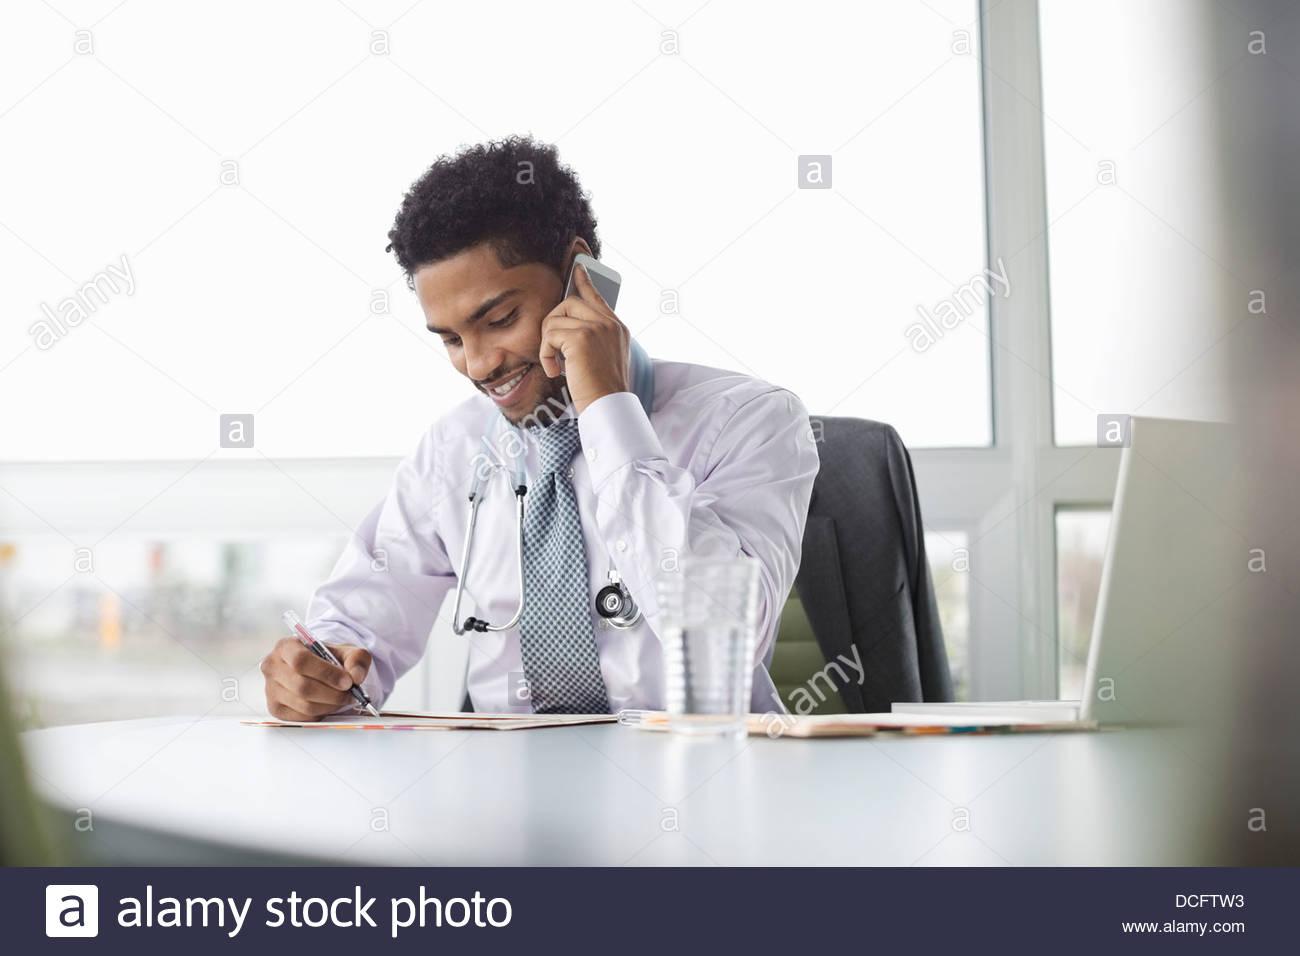 Medico multi-tasking Immagini Stock